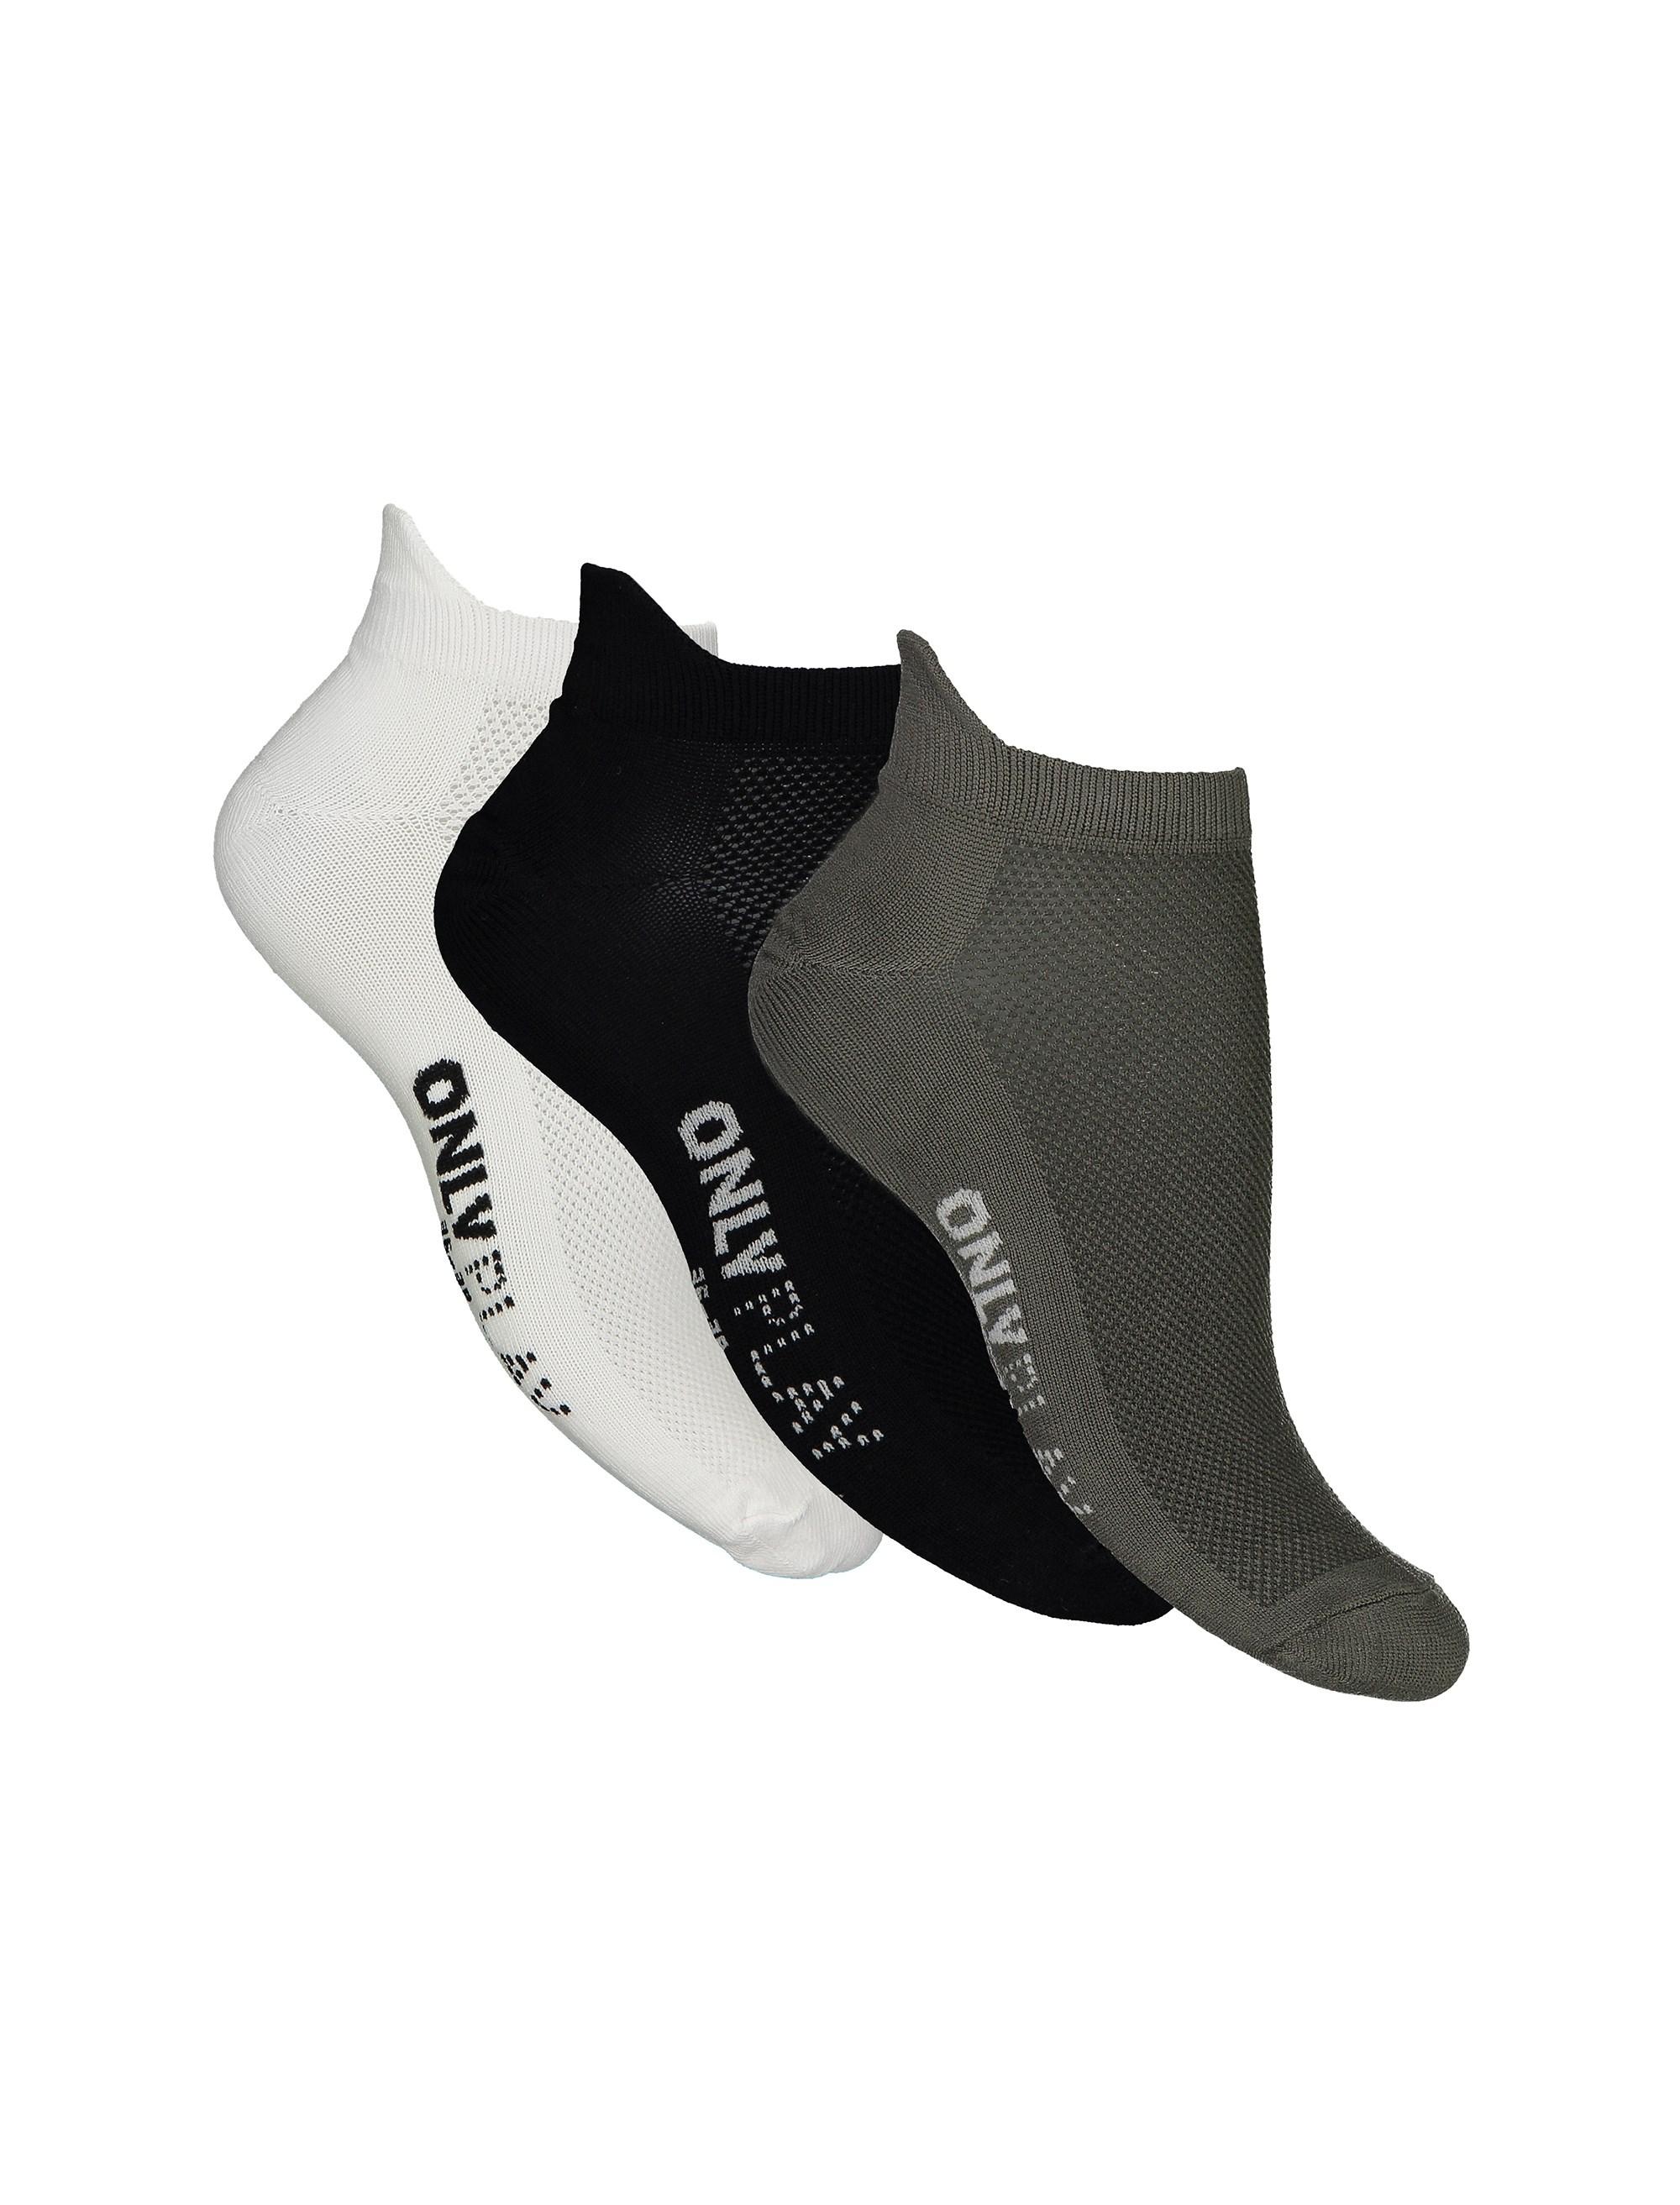 جوراب بدون ساق زنانه بسته 3 عددی